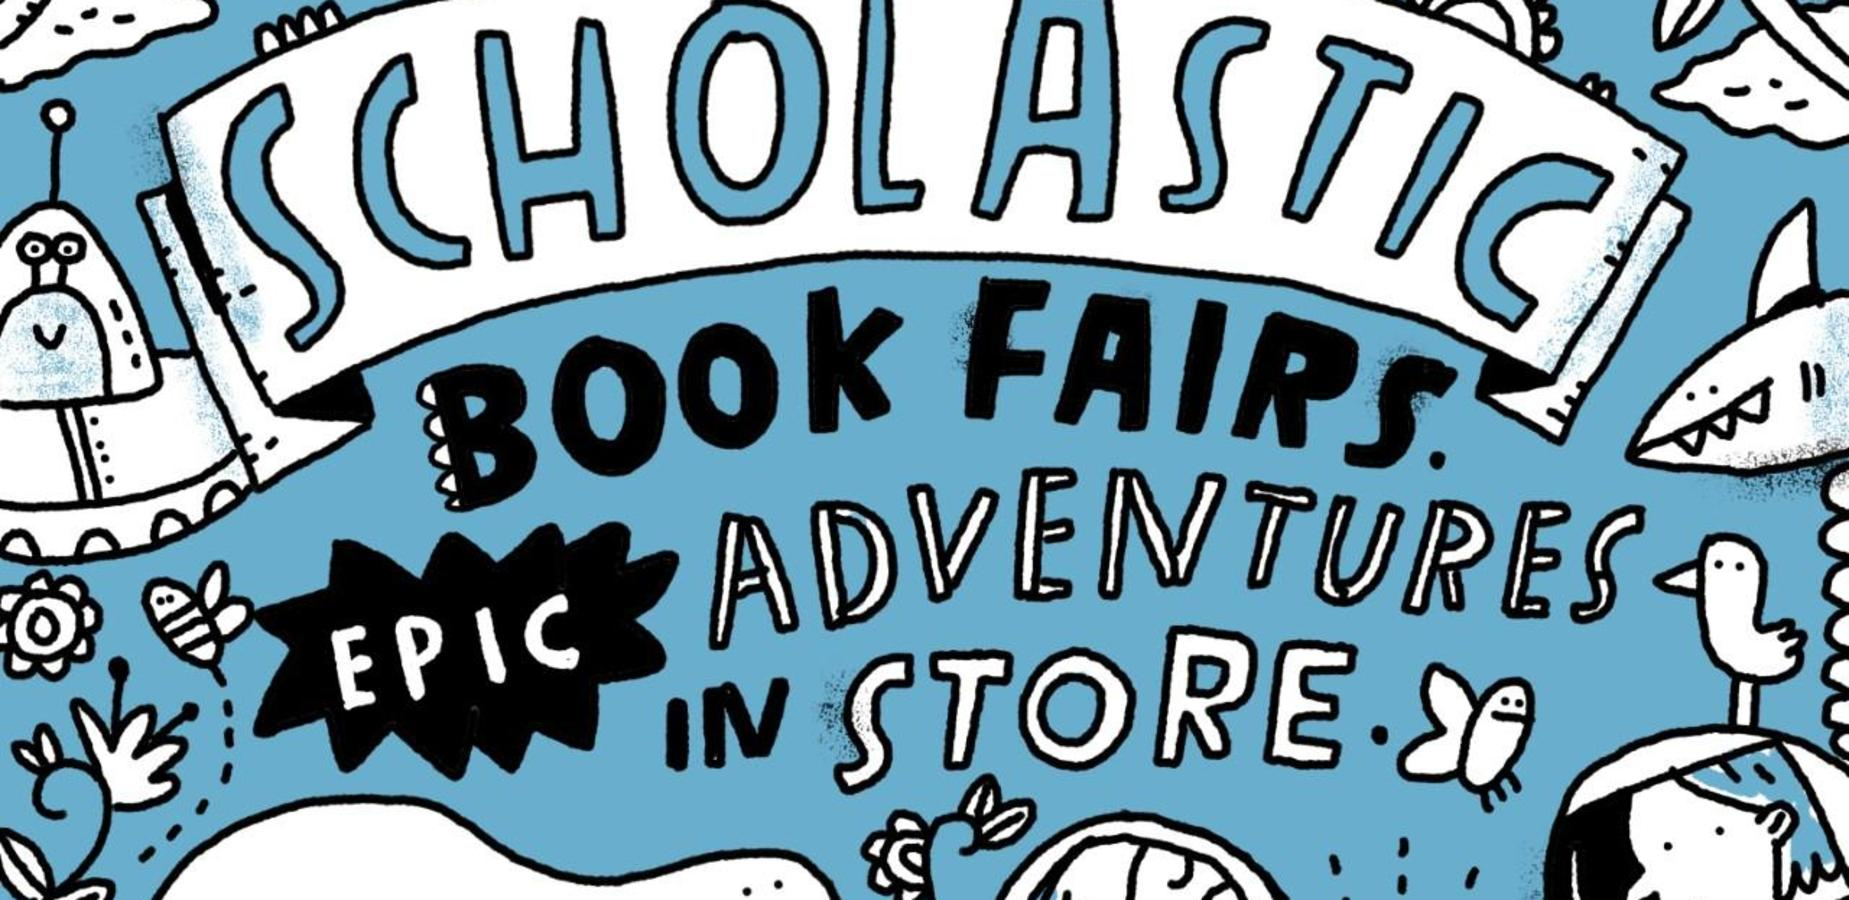 LFE Scholastic Book Fair